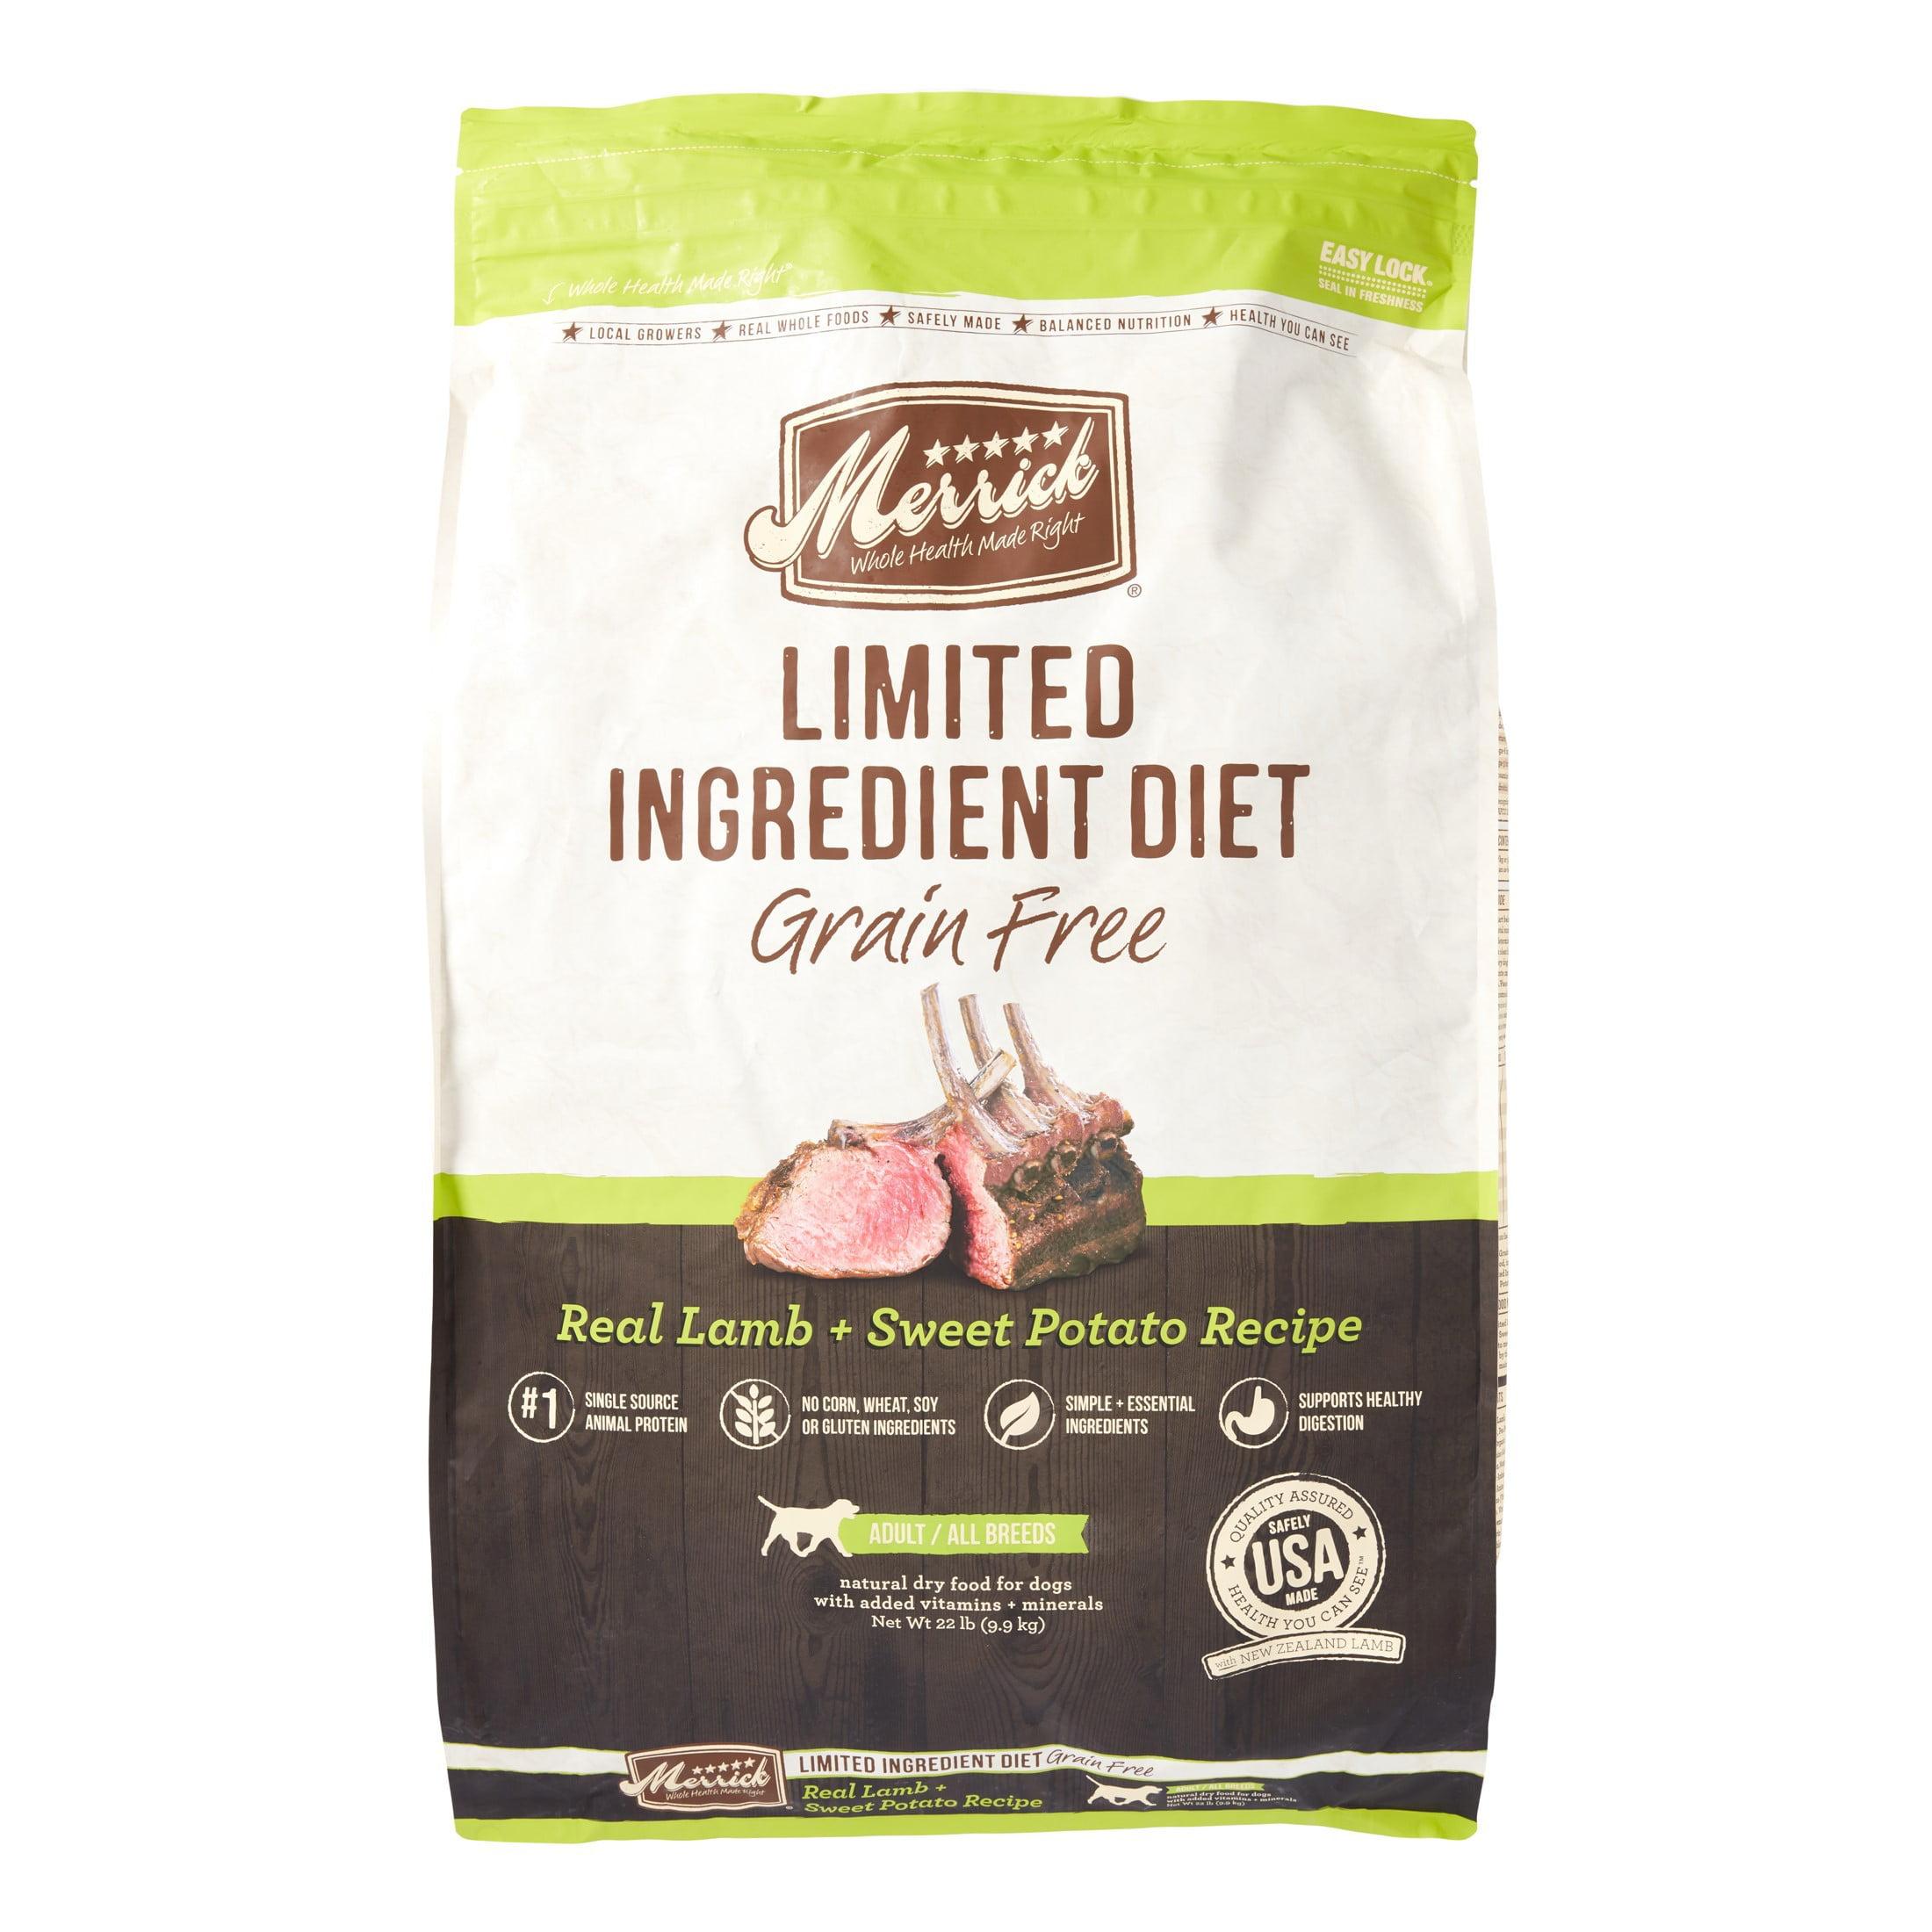 Merrick Limited Ingredient Diet Grain-Free Real Lamb + Sweet Potato Recipe Dry Dog Food, 22 lb